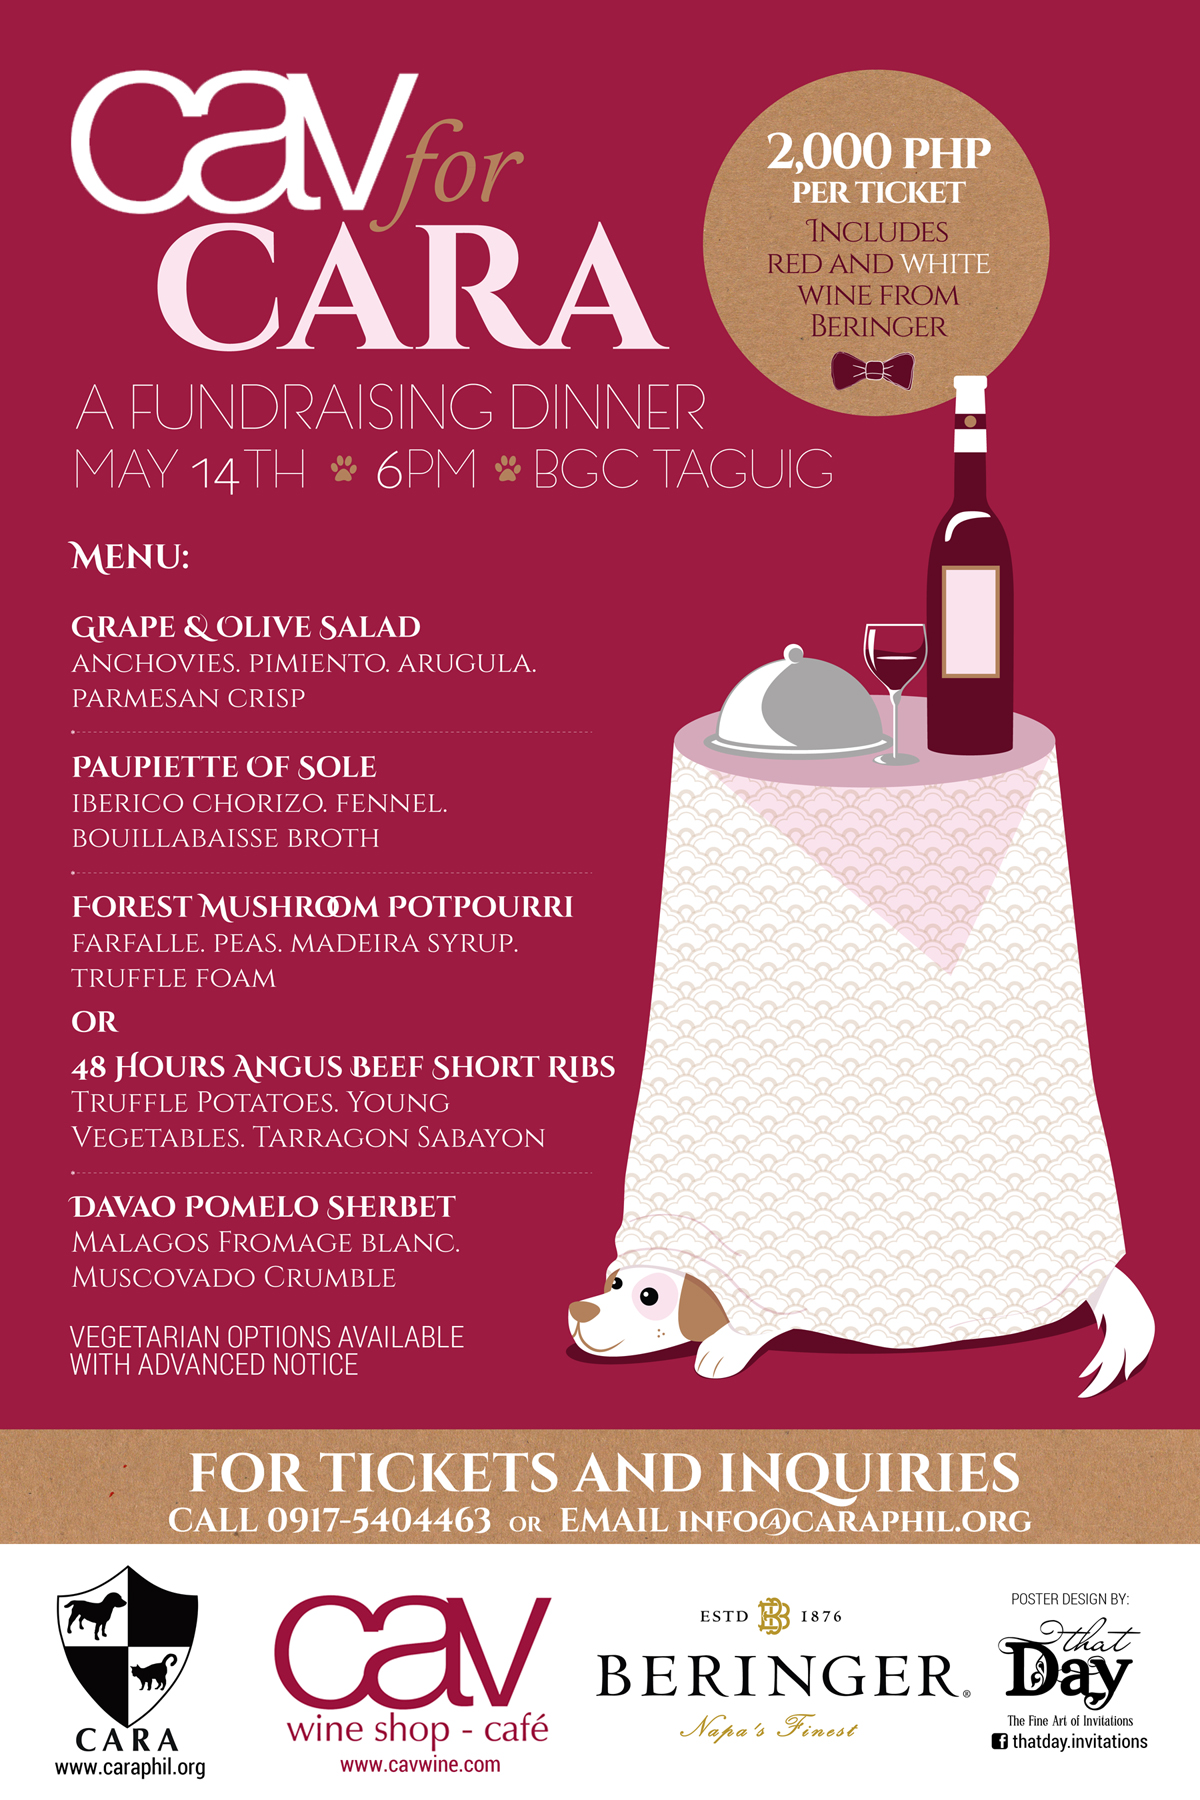 CAV for CARA